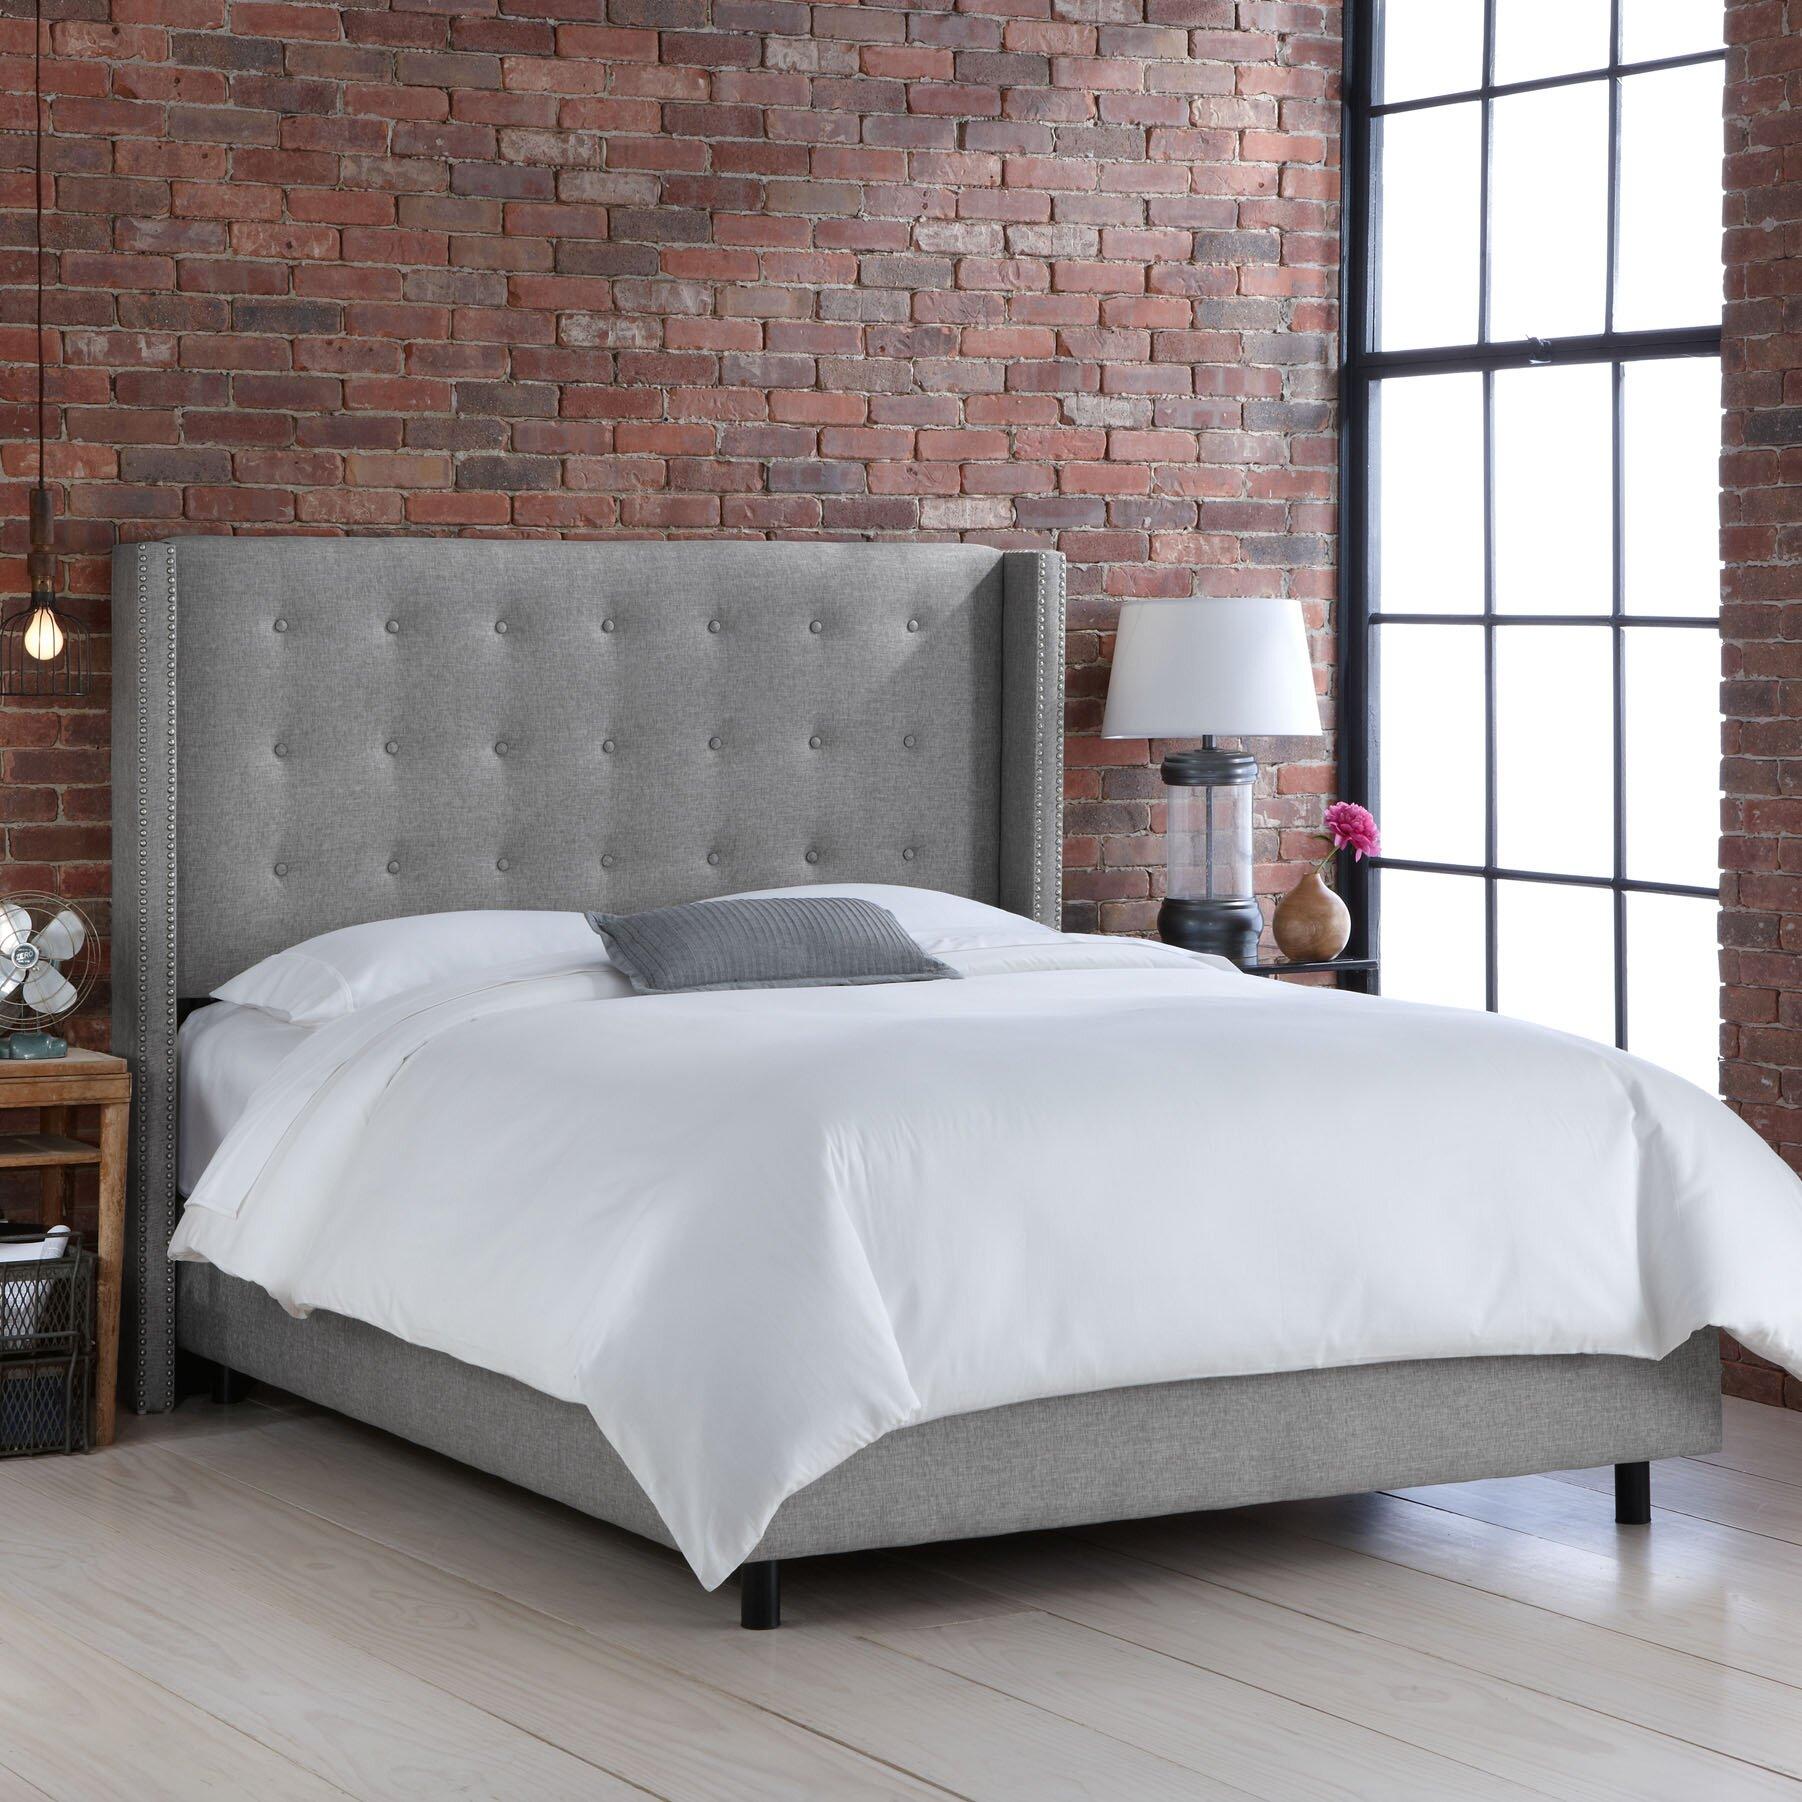 skyline bed skyline tufted nail button wingback velvet  - skyline wingback bed skyline furniture